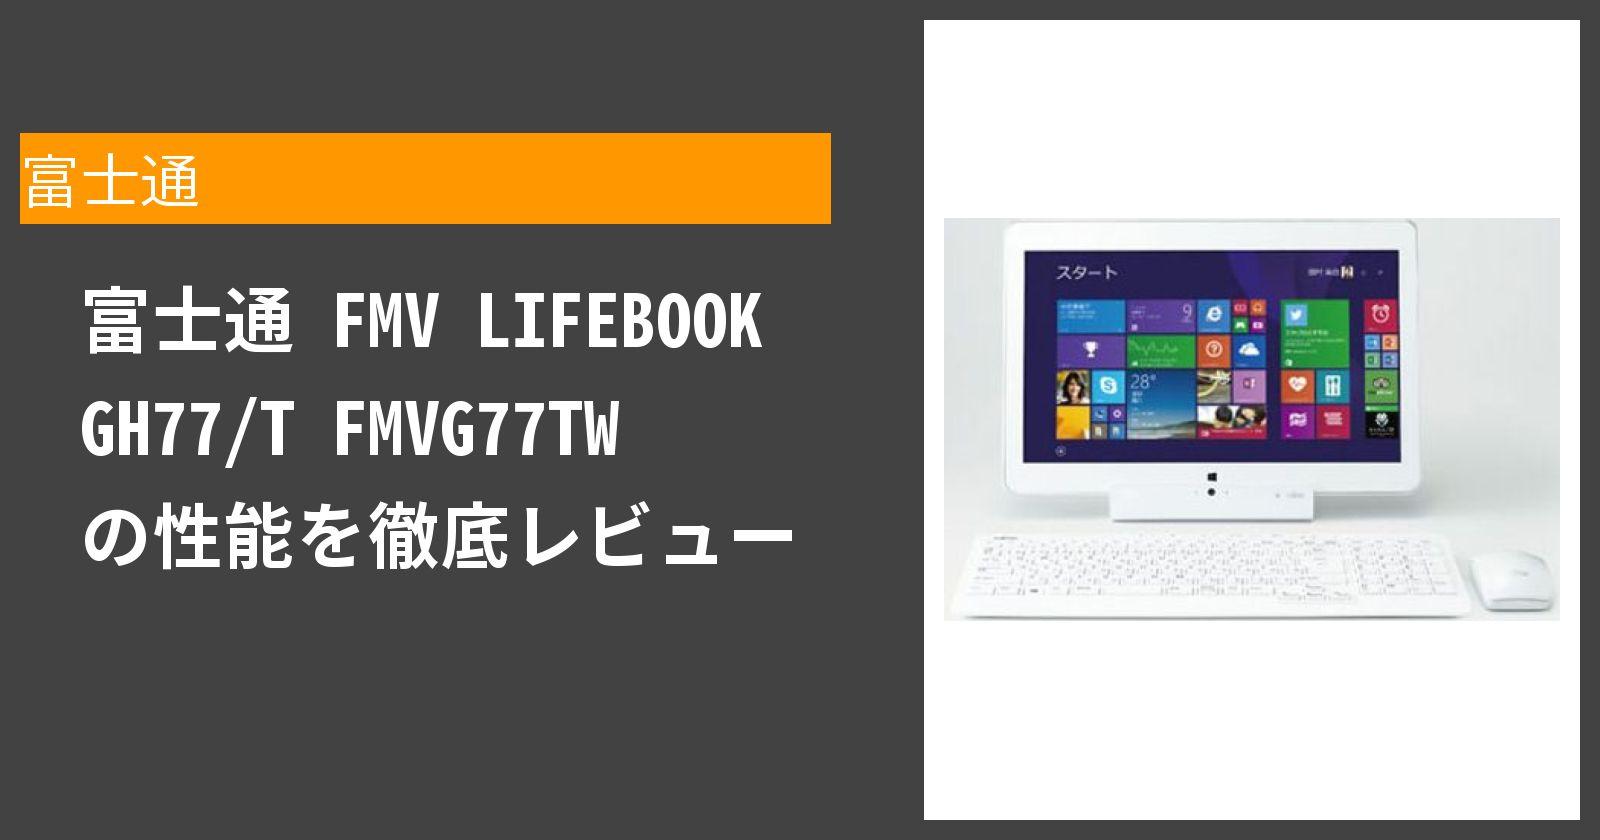 FMV LIFEBOOK GH77/T の性能を徹底レビュー